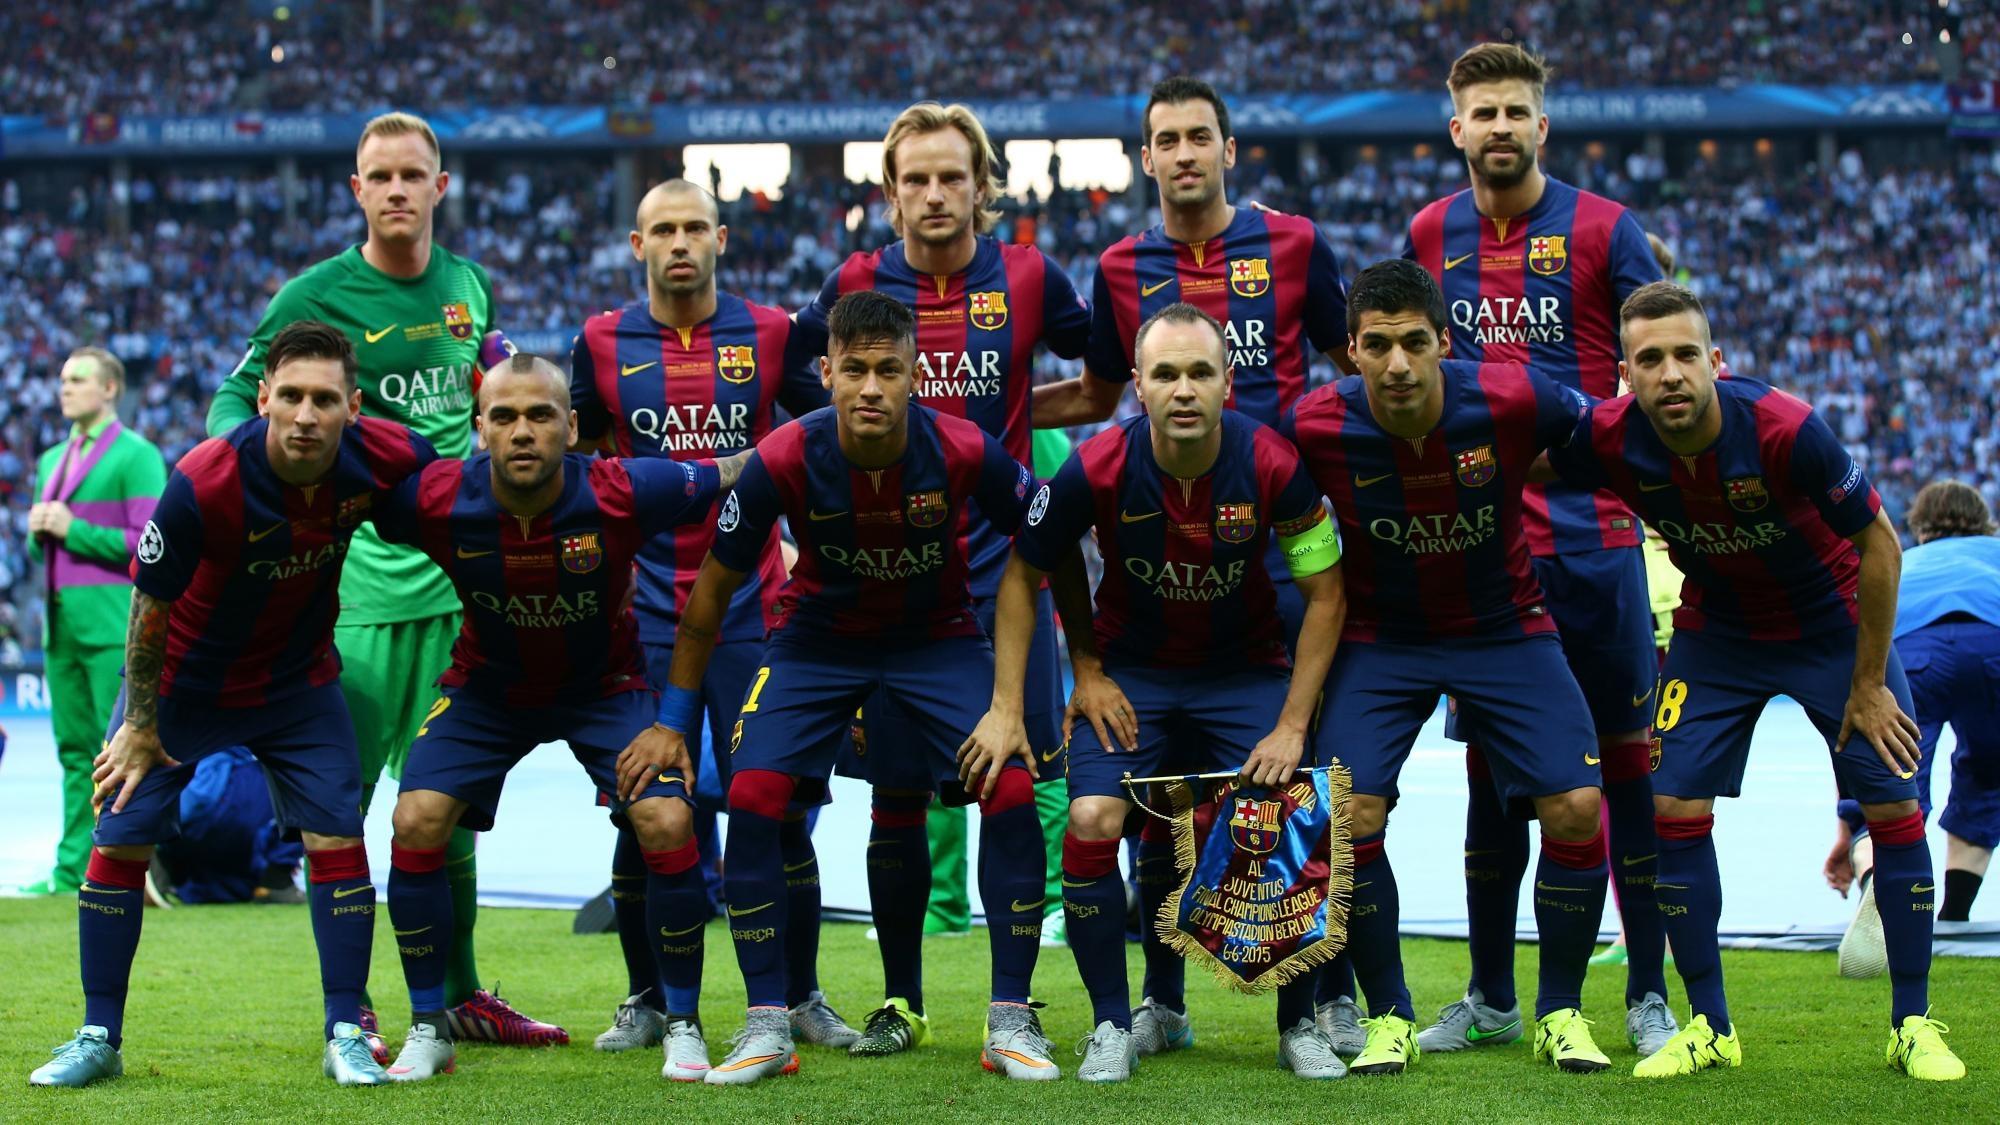 Барселона: «Барселона» в двух шагах от рекорда